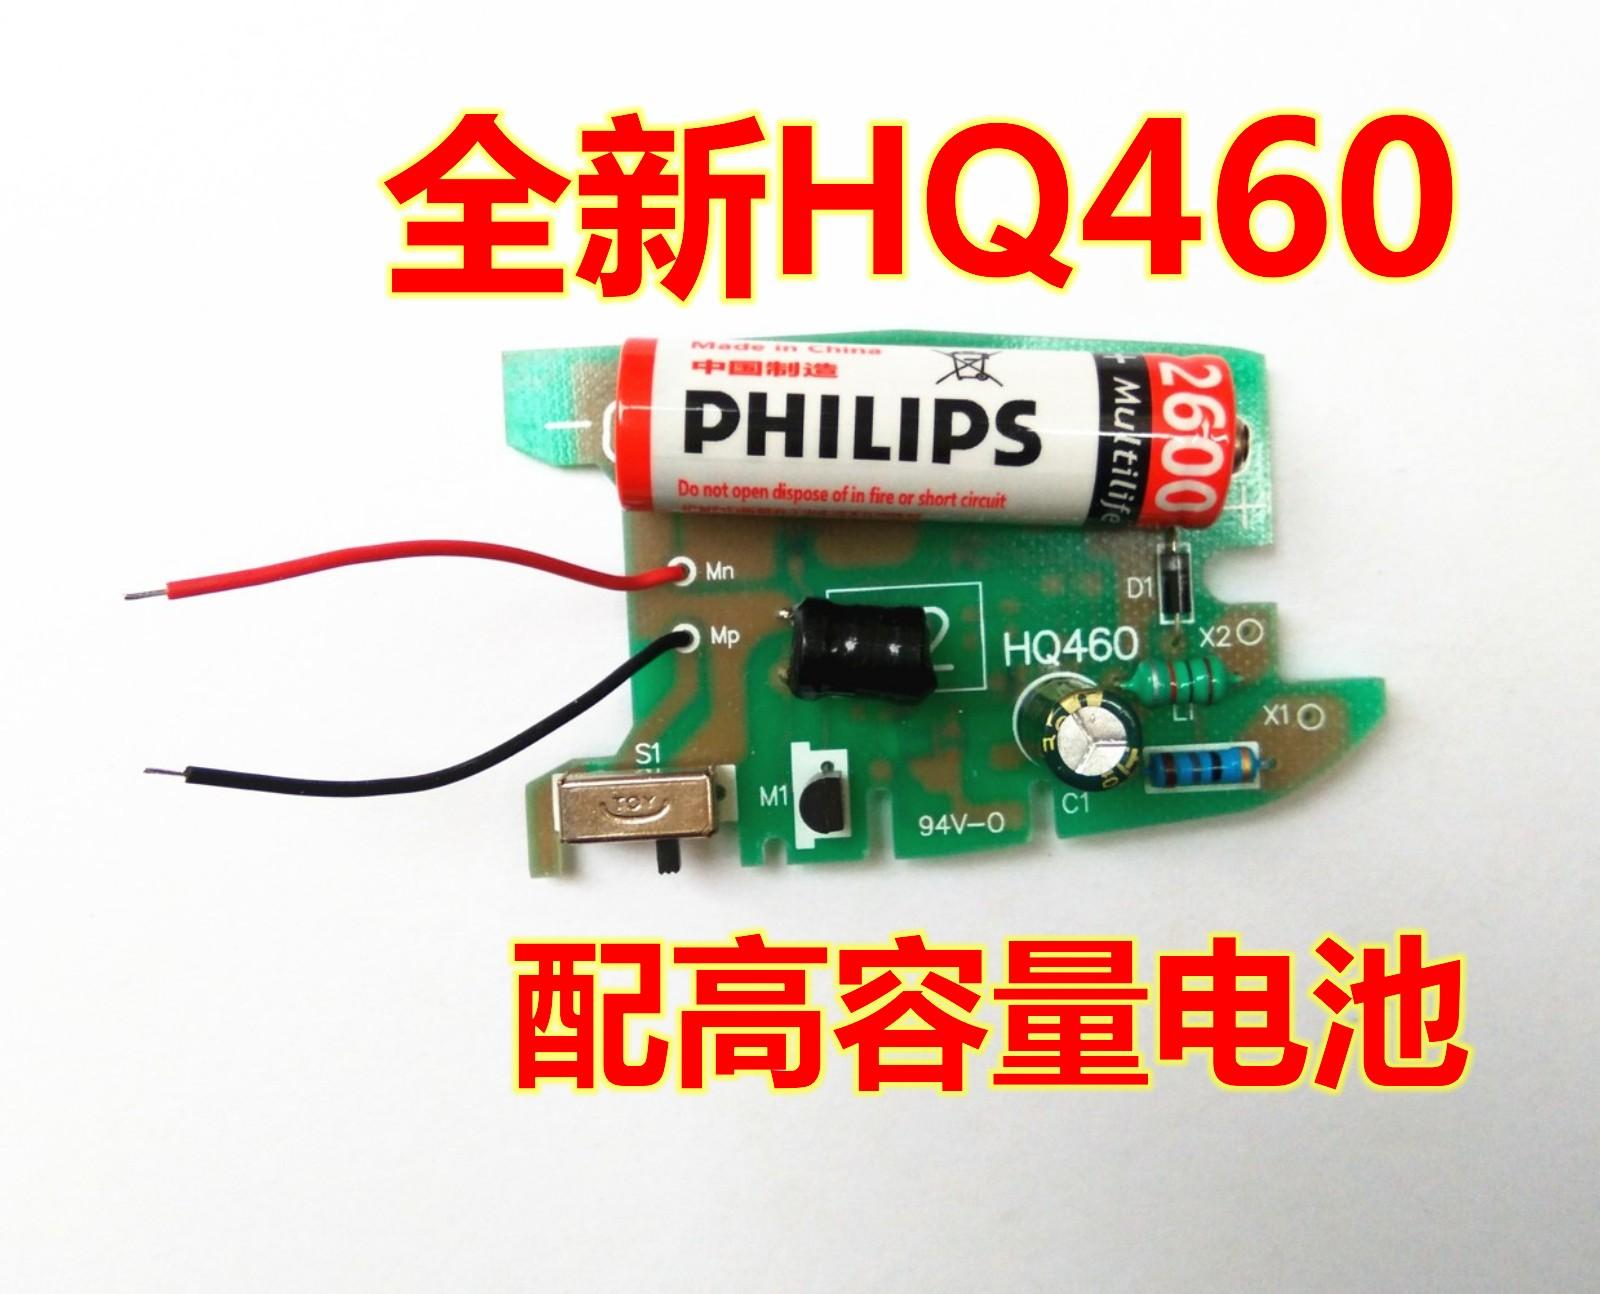 HQ460全新配件菲利普剃须刀电路板主板线路板电池